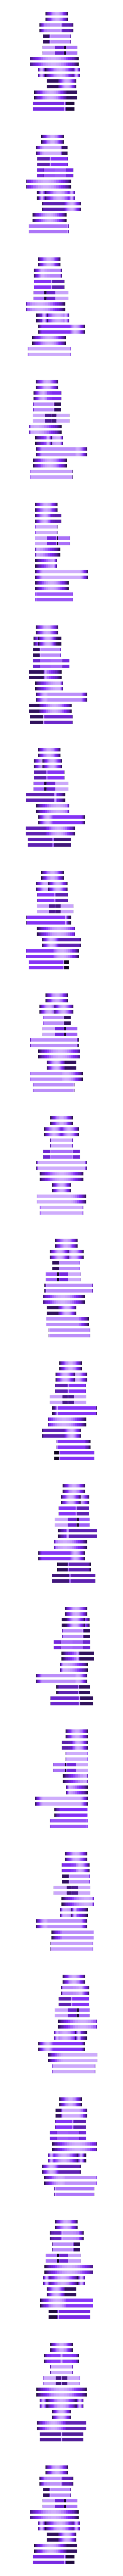 Pack01.stl Download free STL file Shapers • 3D printer design, 3deran